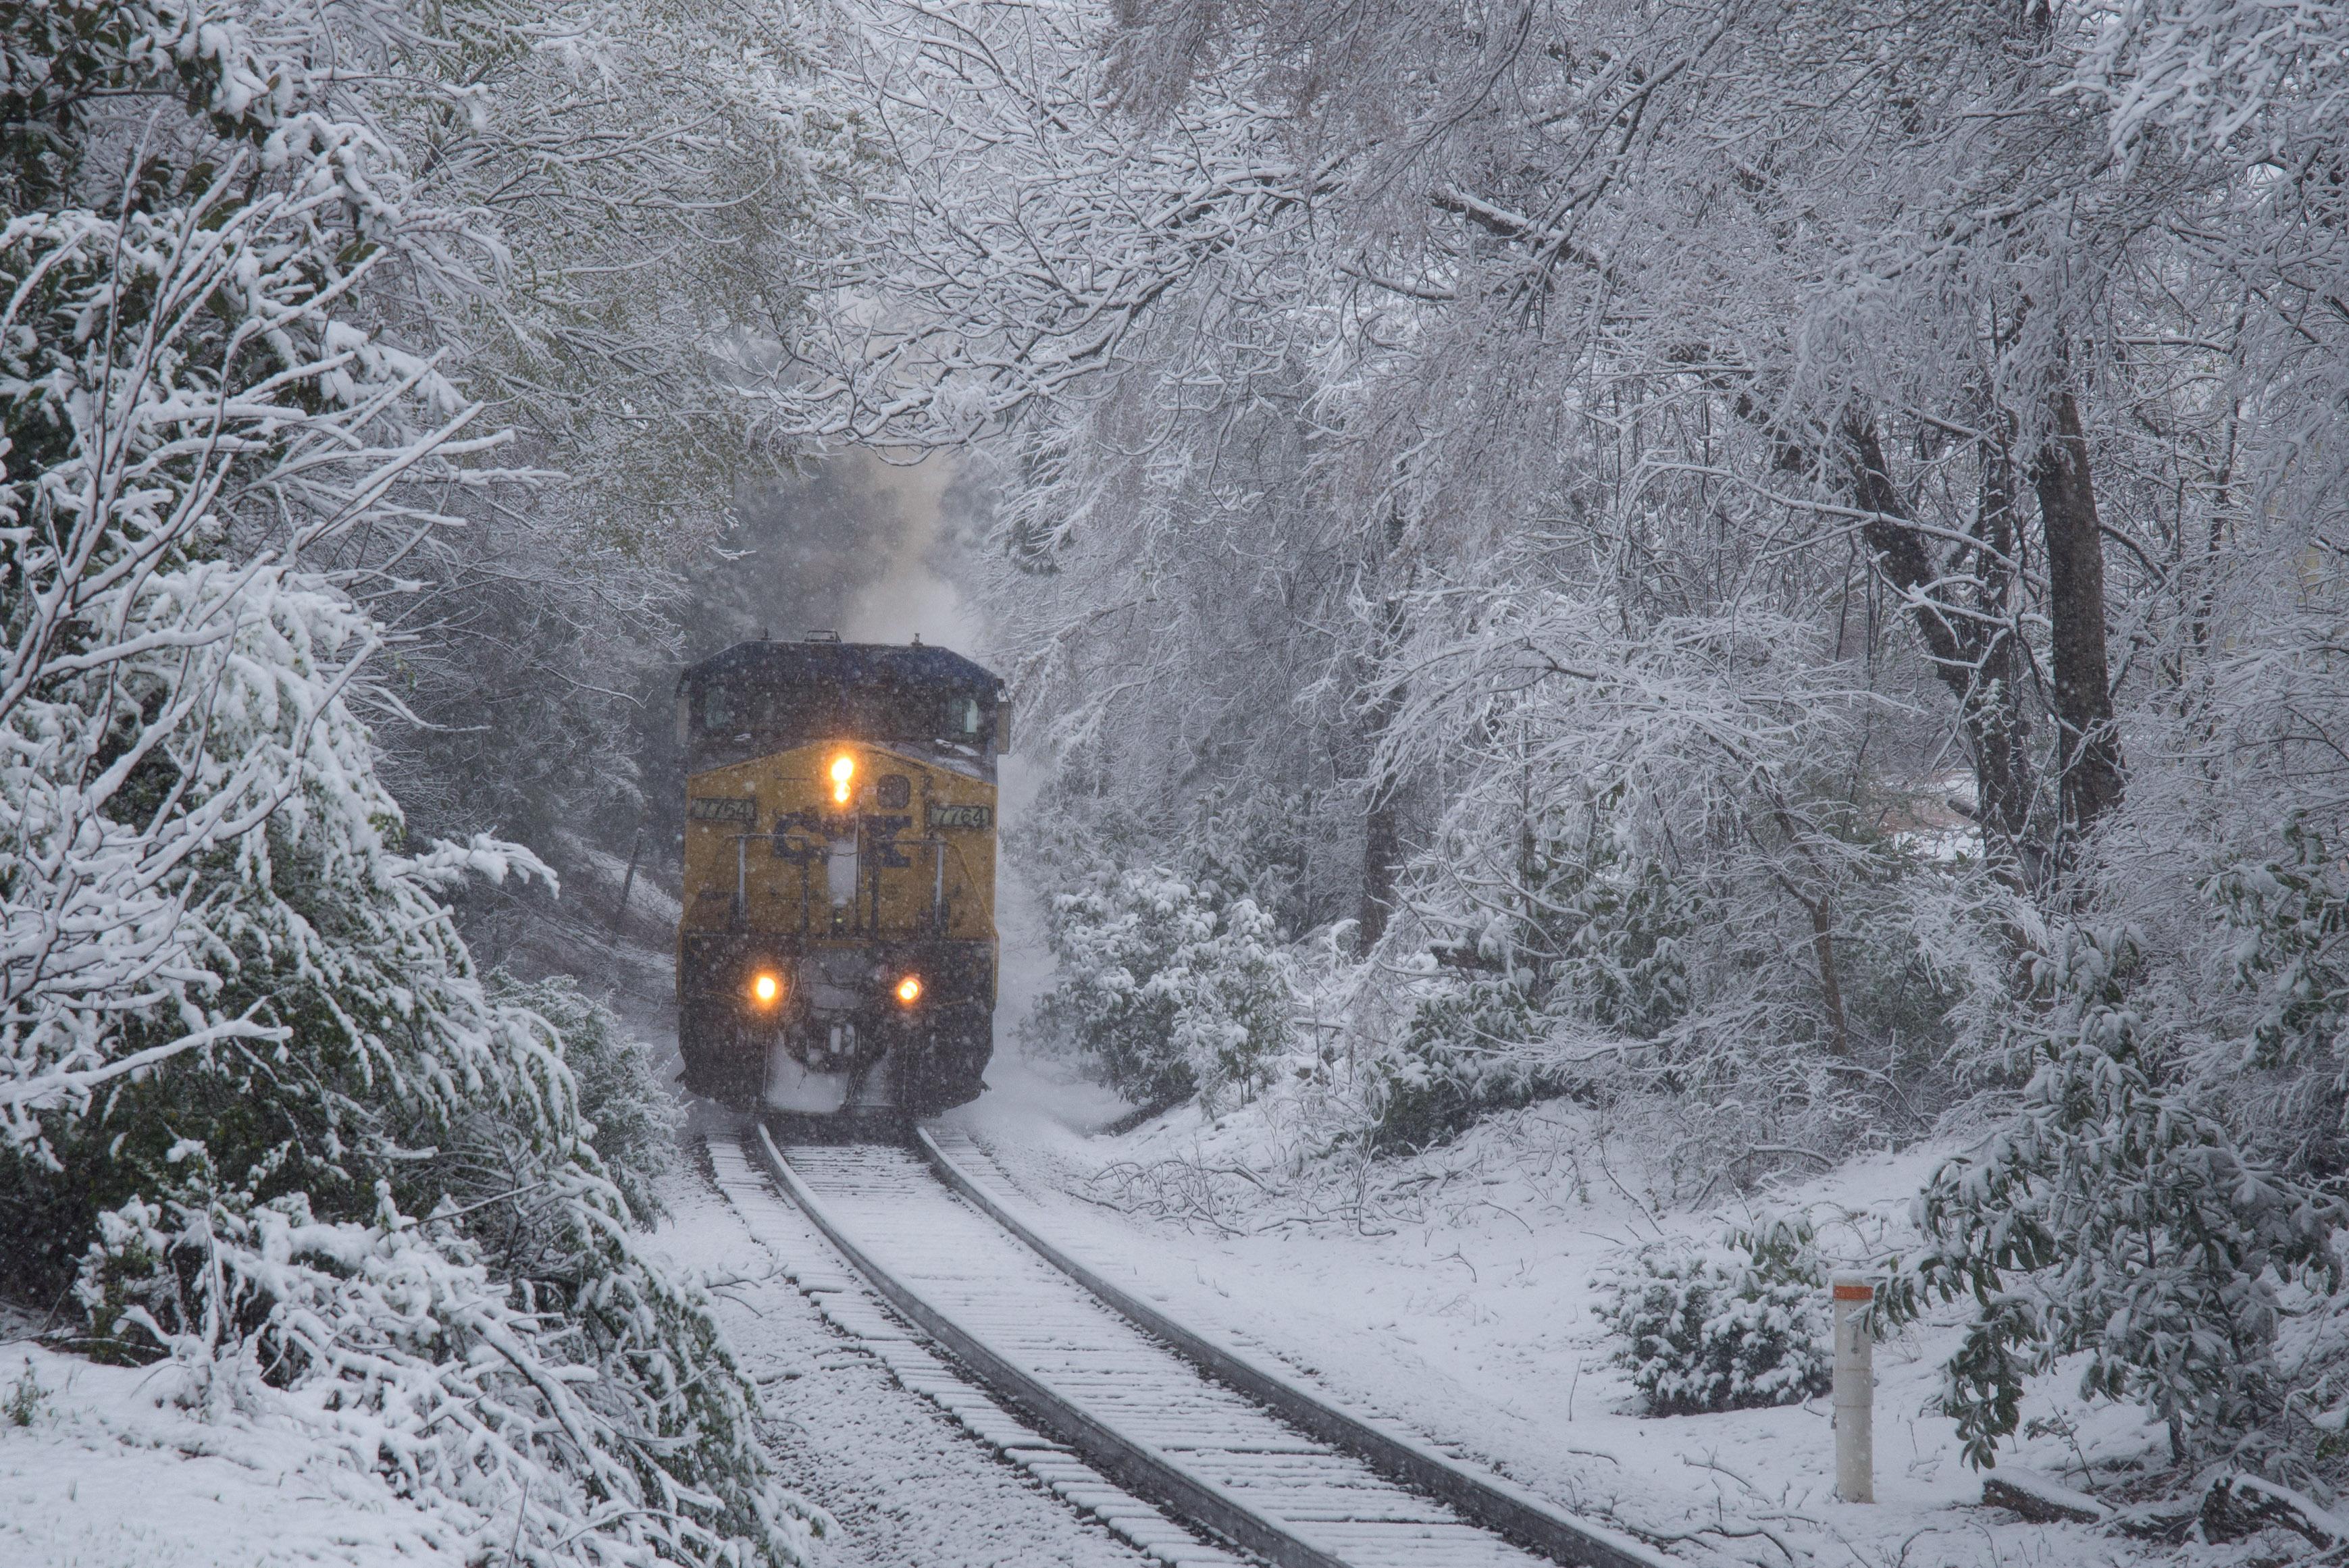 Wallpaper : CSX, csxt, freight, train, railroad, snow